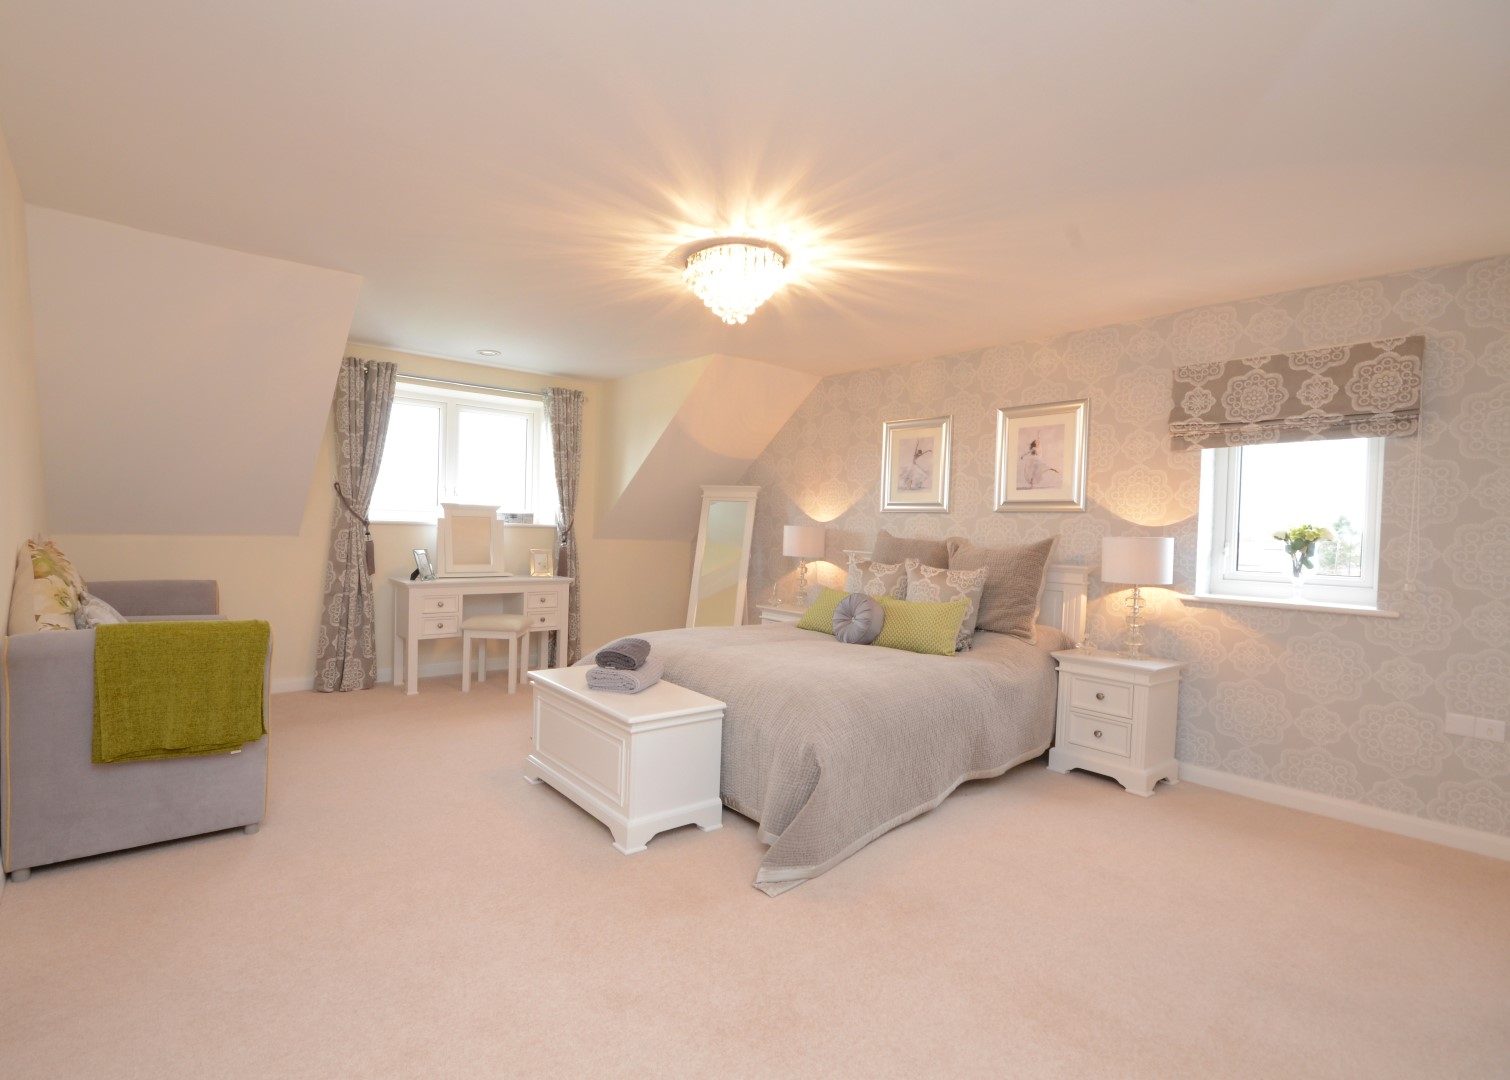 interior-photography-yorkshire-bedroom (2)